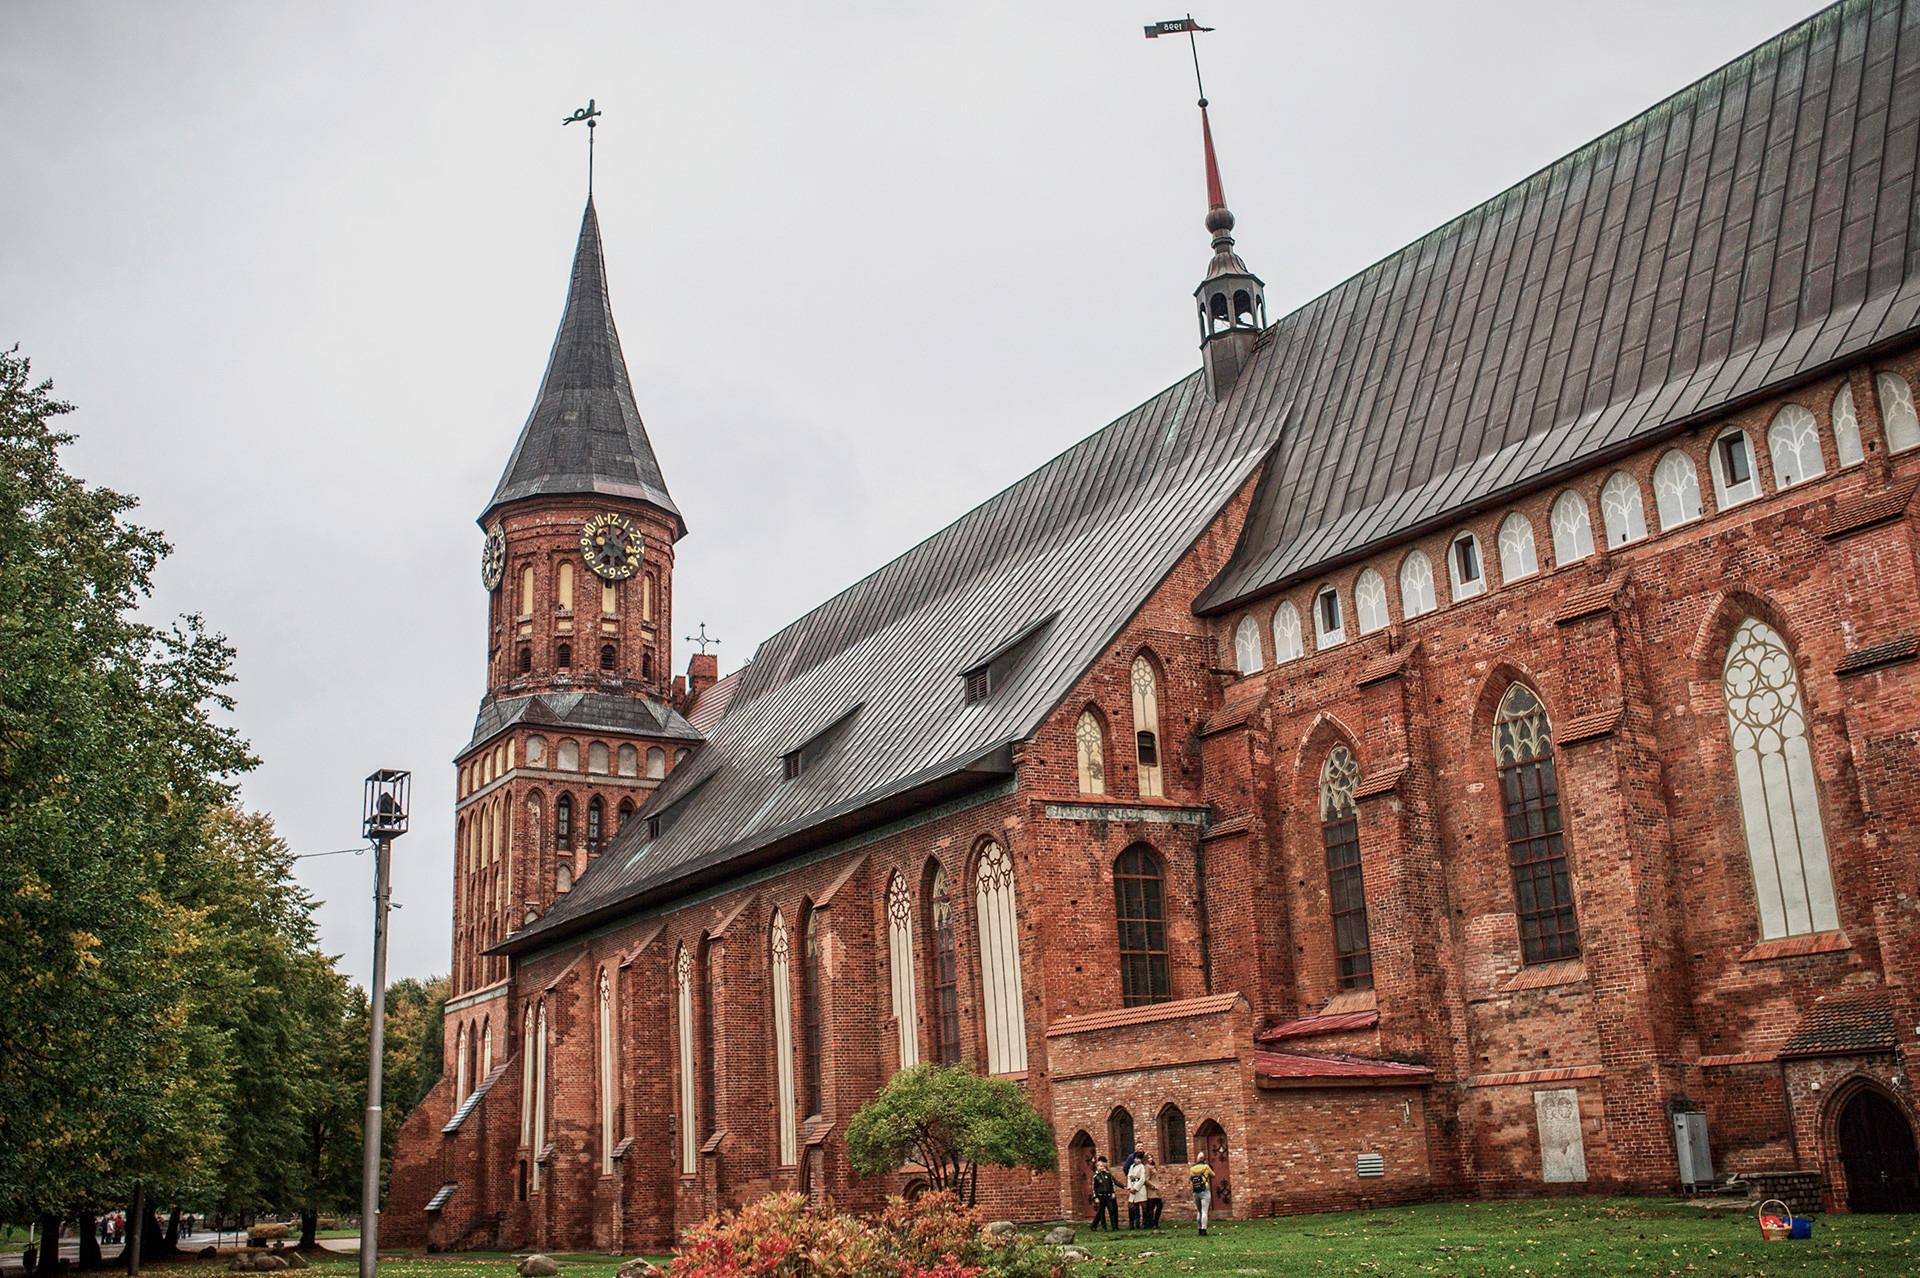 Katedrala u Kalinjingradu